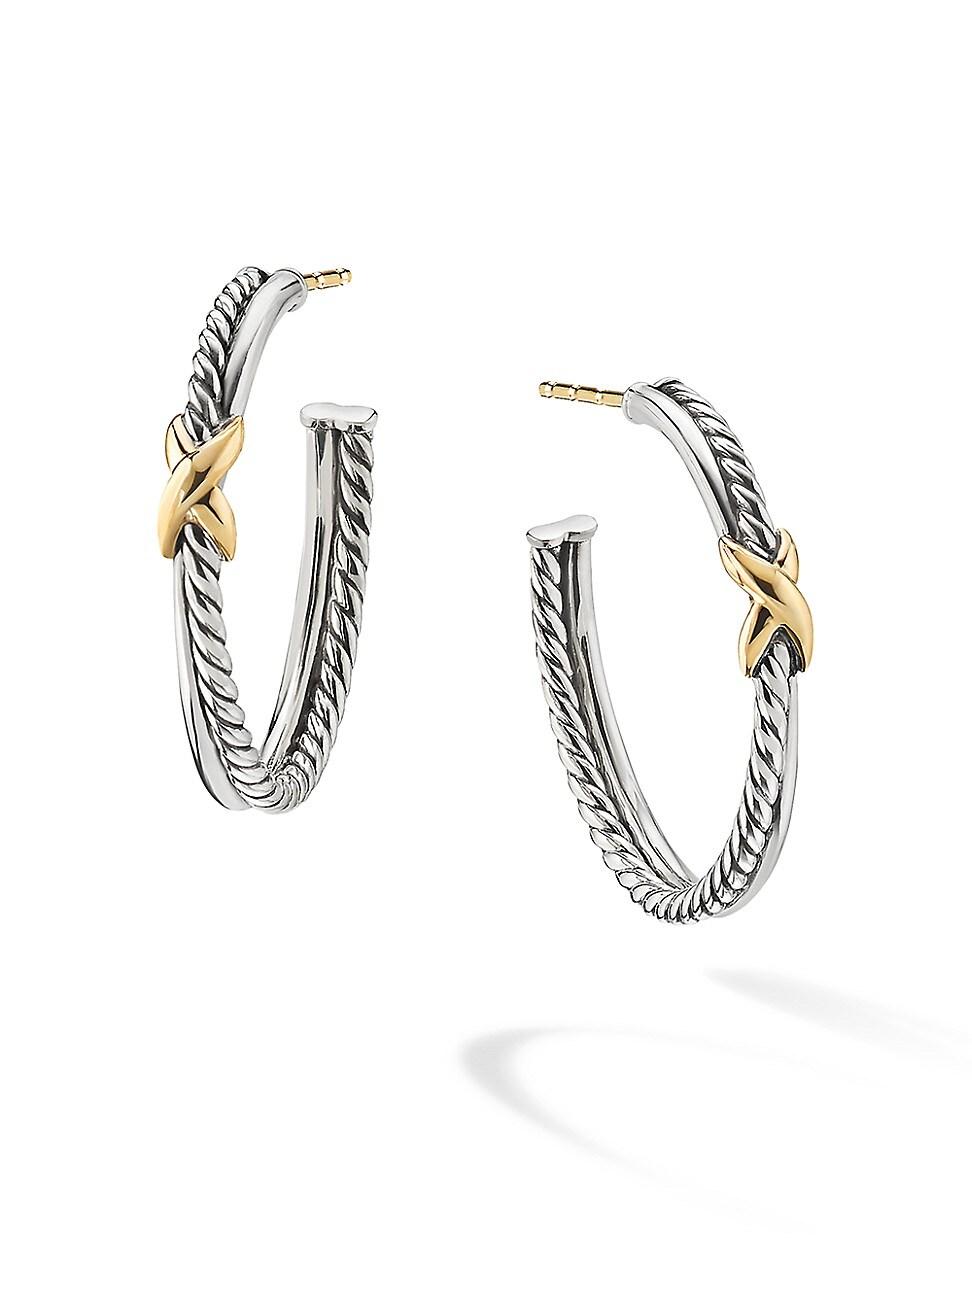 David Yurman Accessories WOMEN'S PETITE X HOOP EARRINGS WITH 18K YELLOW GOLD